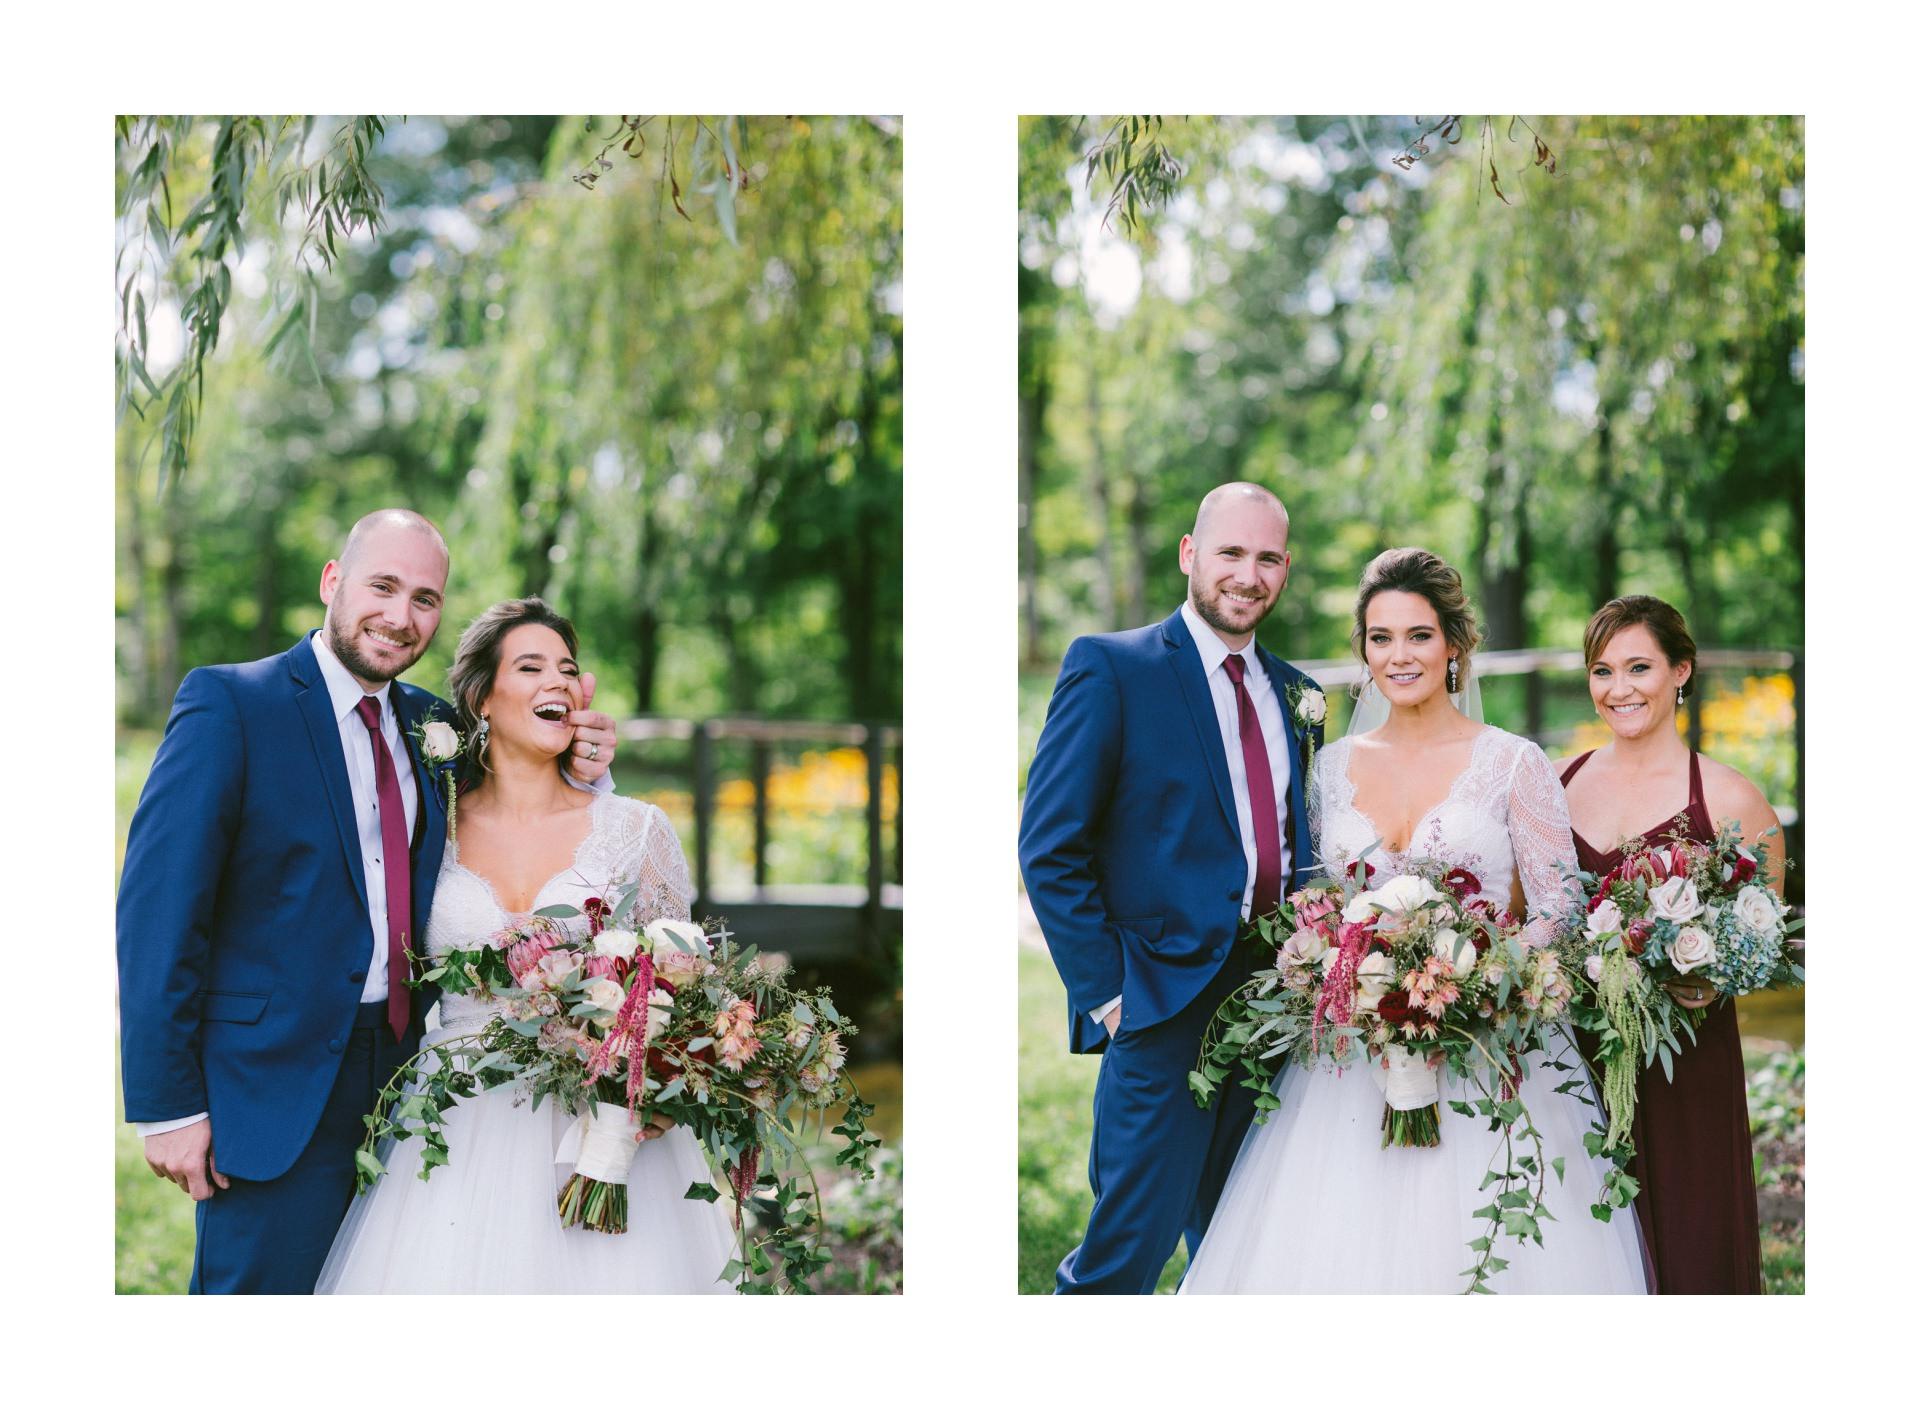 Meadow Ridge Farm Wedding Photos in Windsor 1 37.jpg